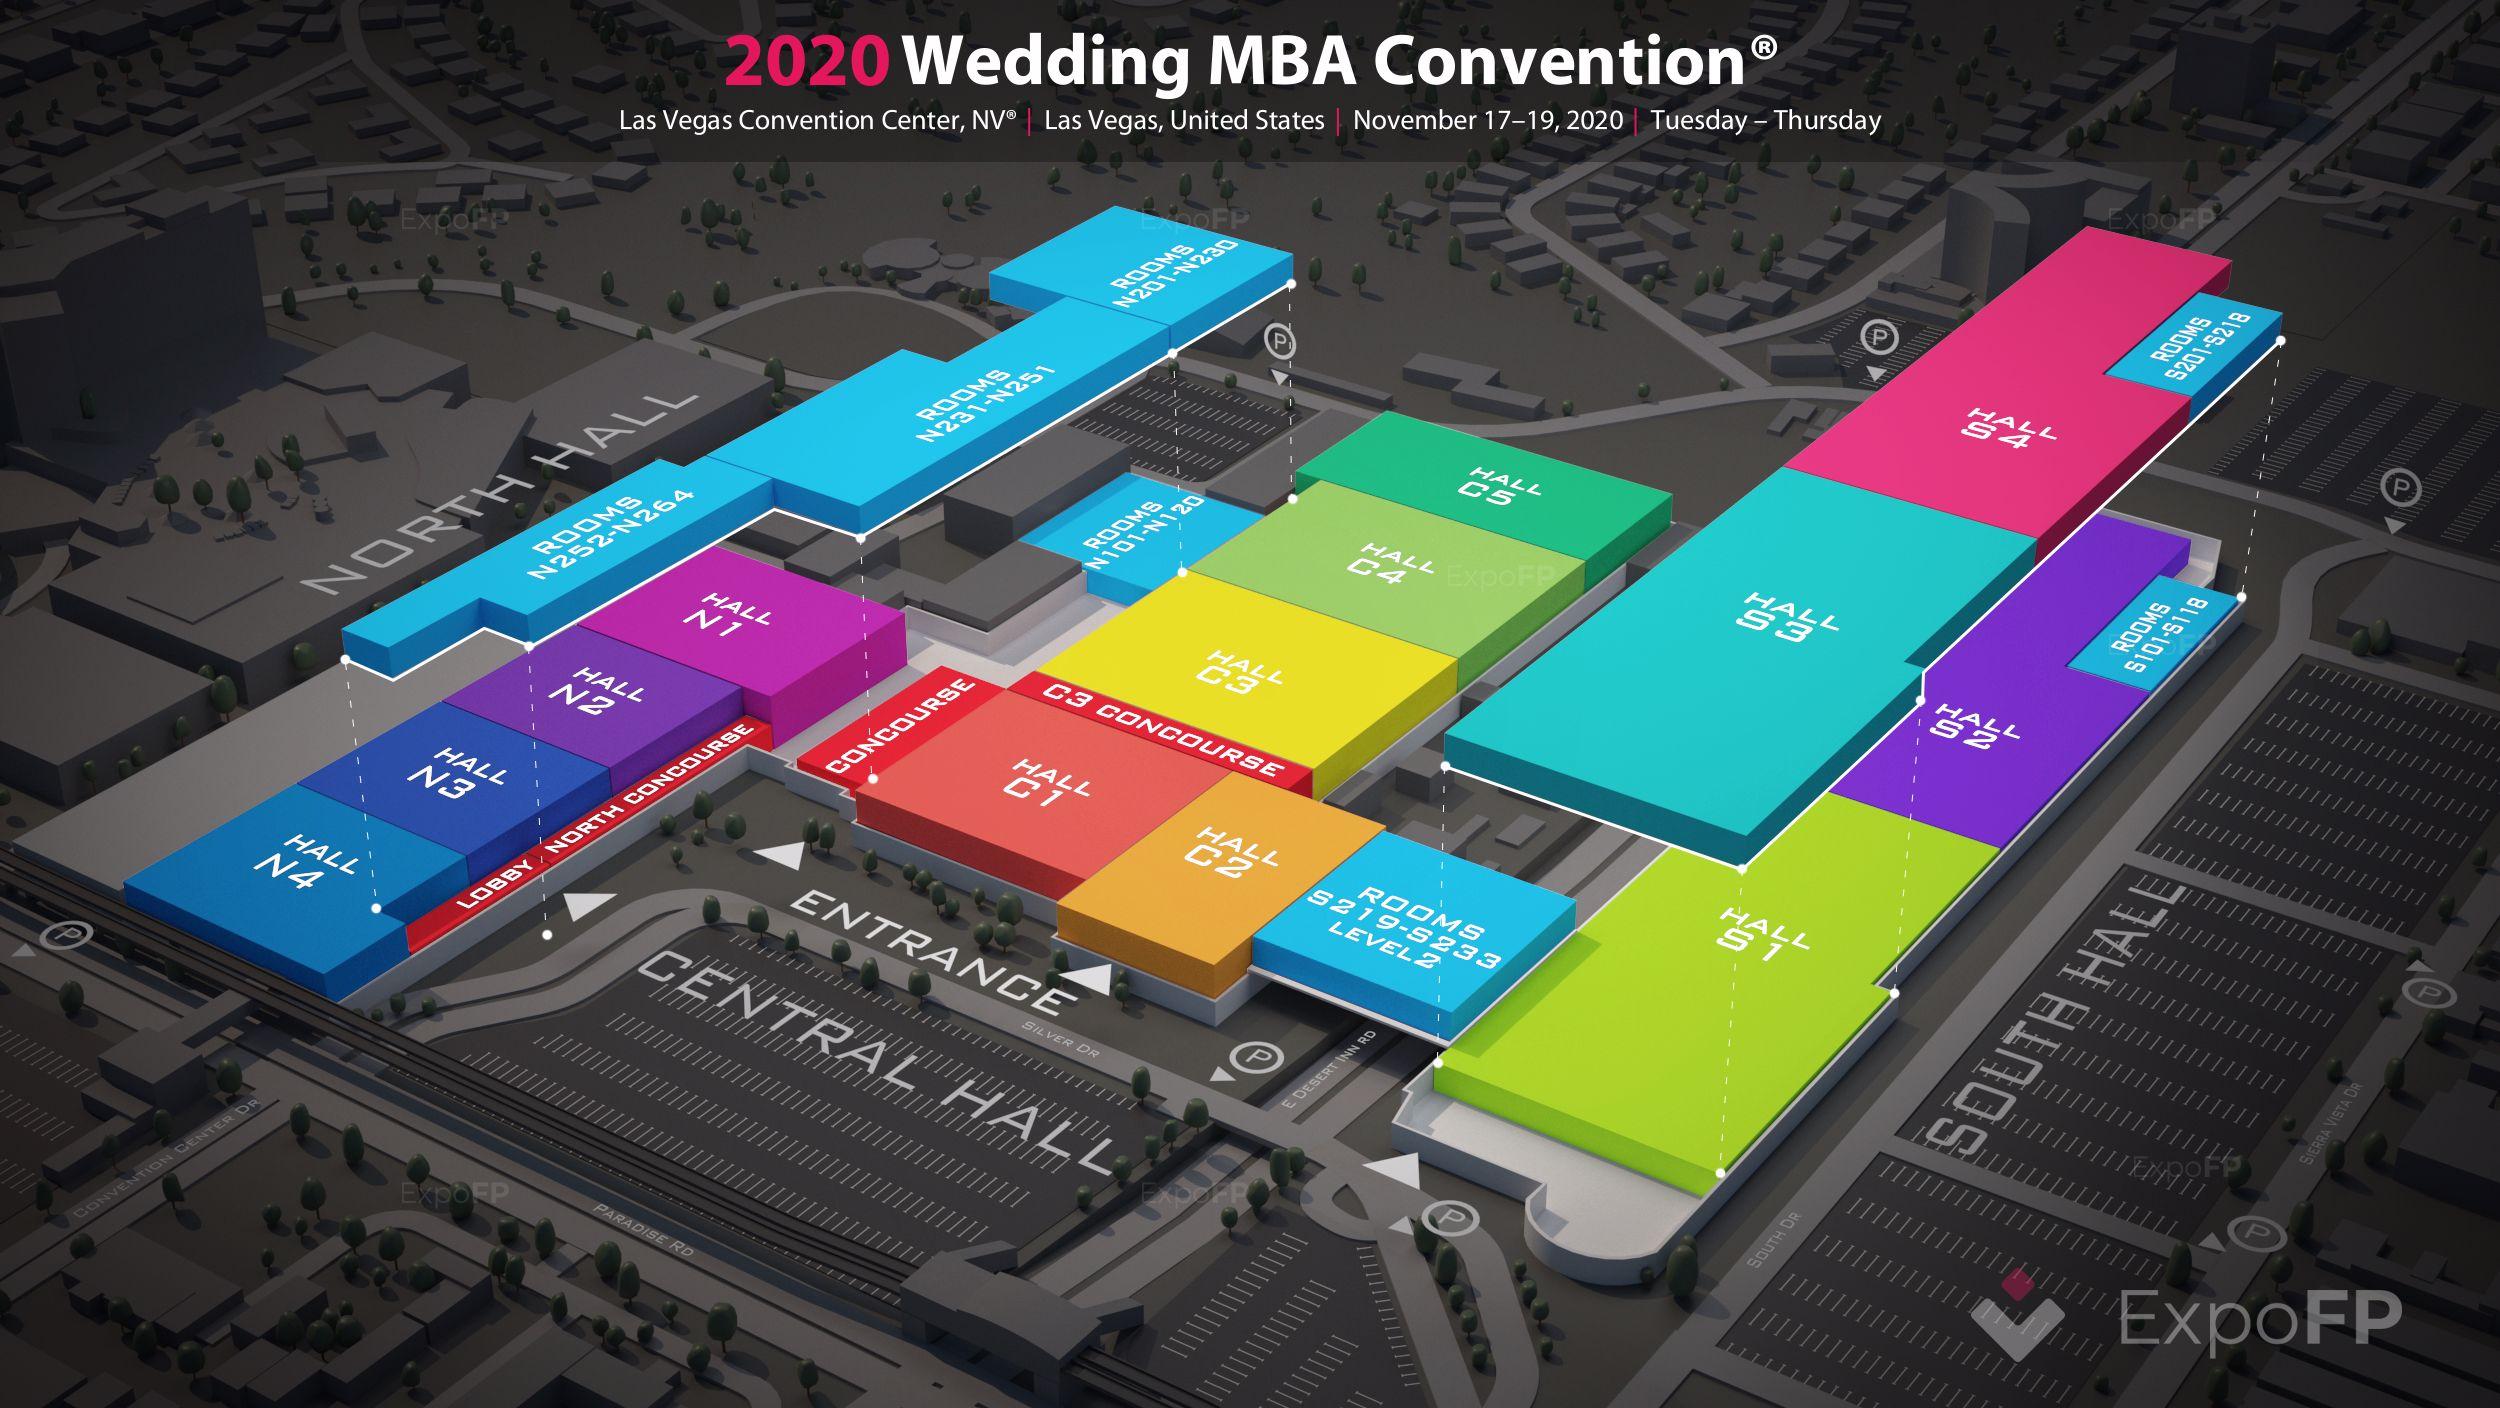 Wedding mba convention 2020 las vegas | las vegas convention center floorplan | wedding mba convention 2020